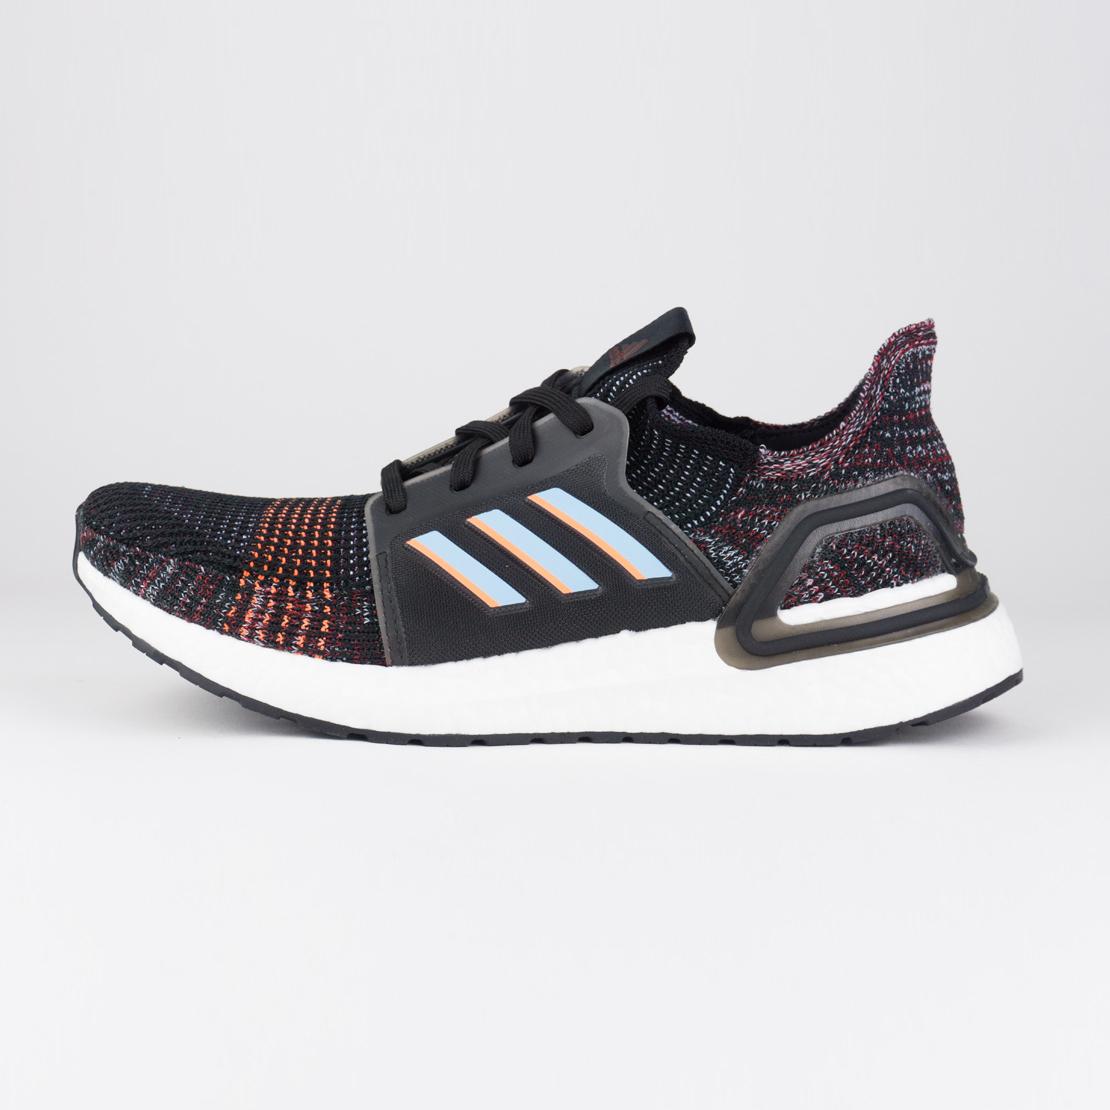 Adidas Ultraboost 19 - Men Shoes (core Black / Glow Blue) G54011.